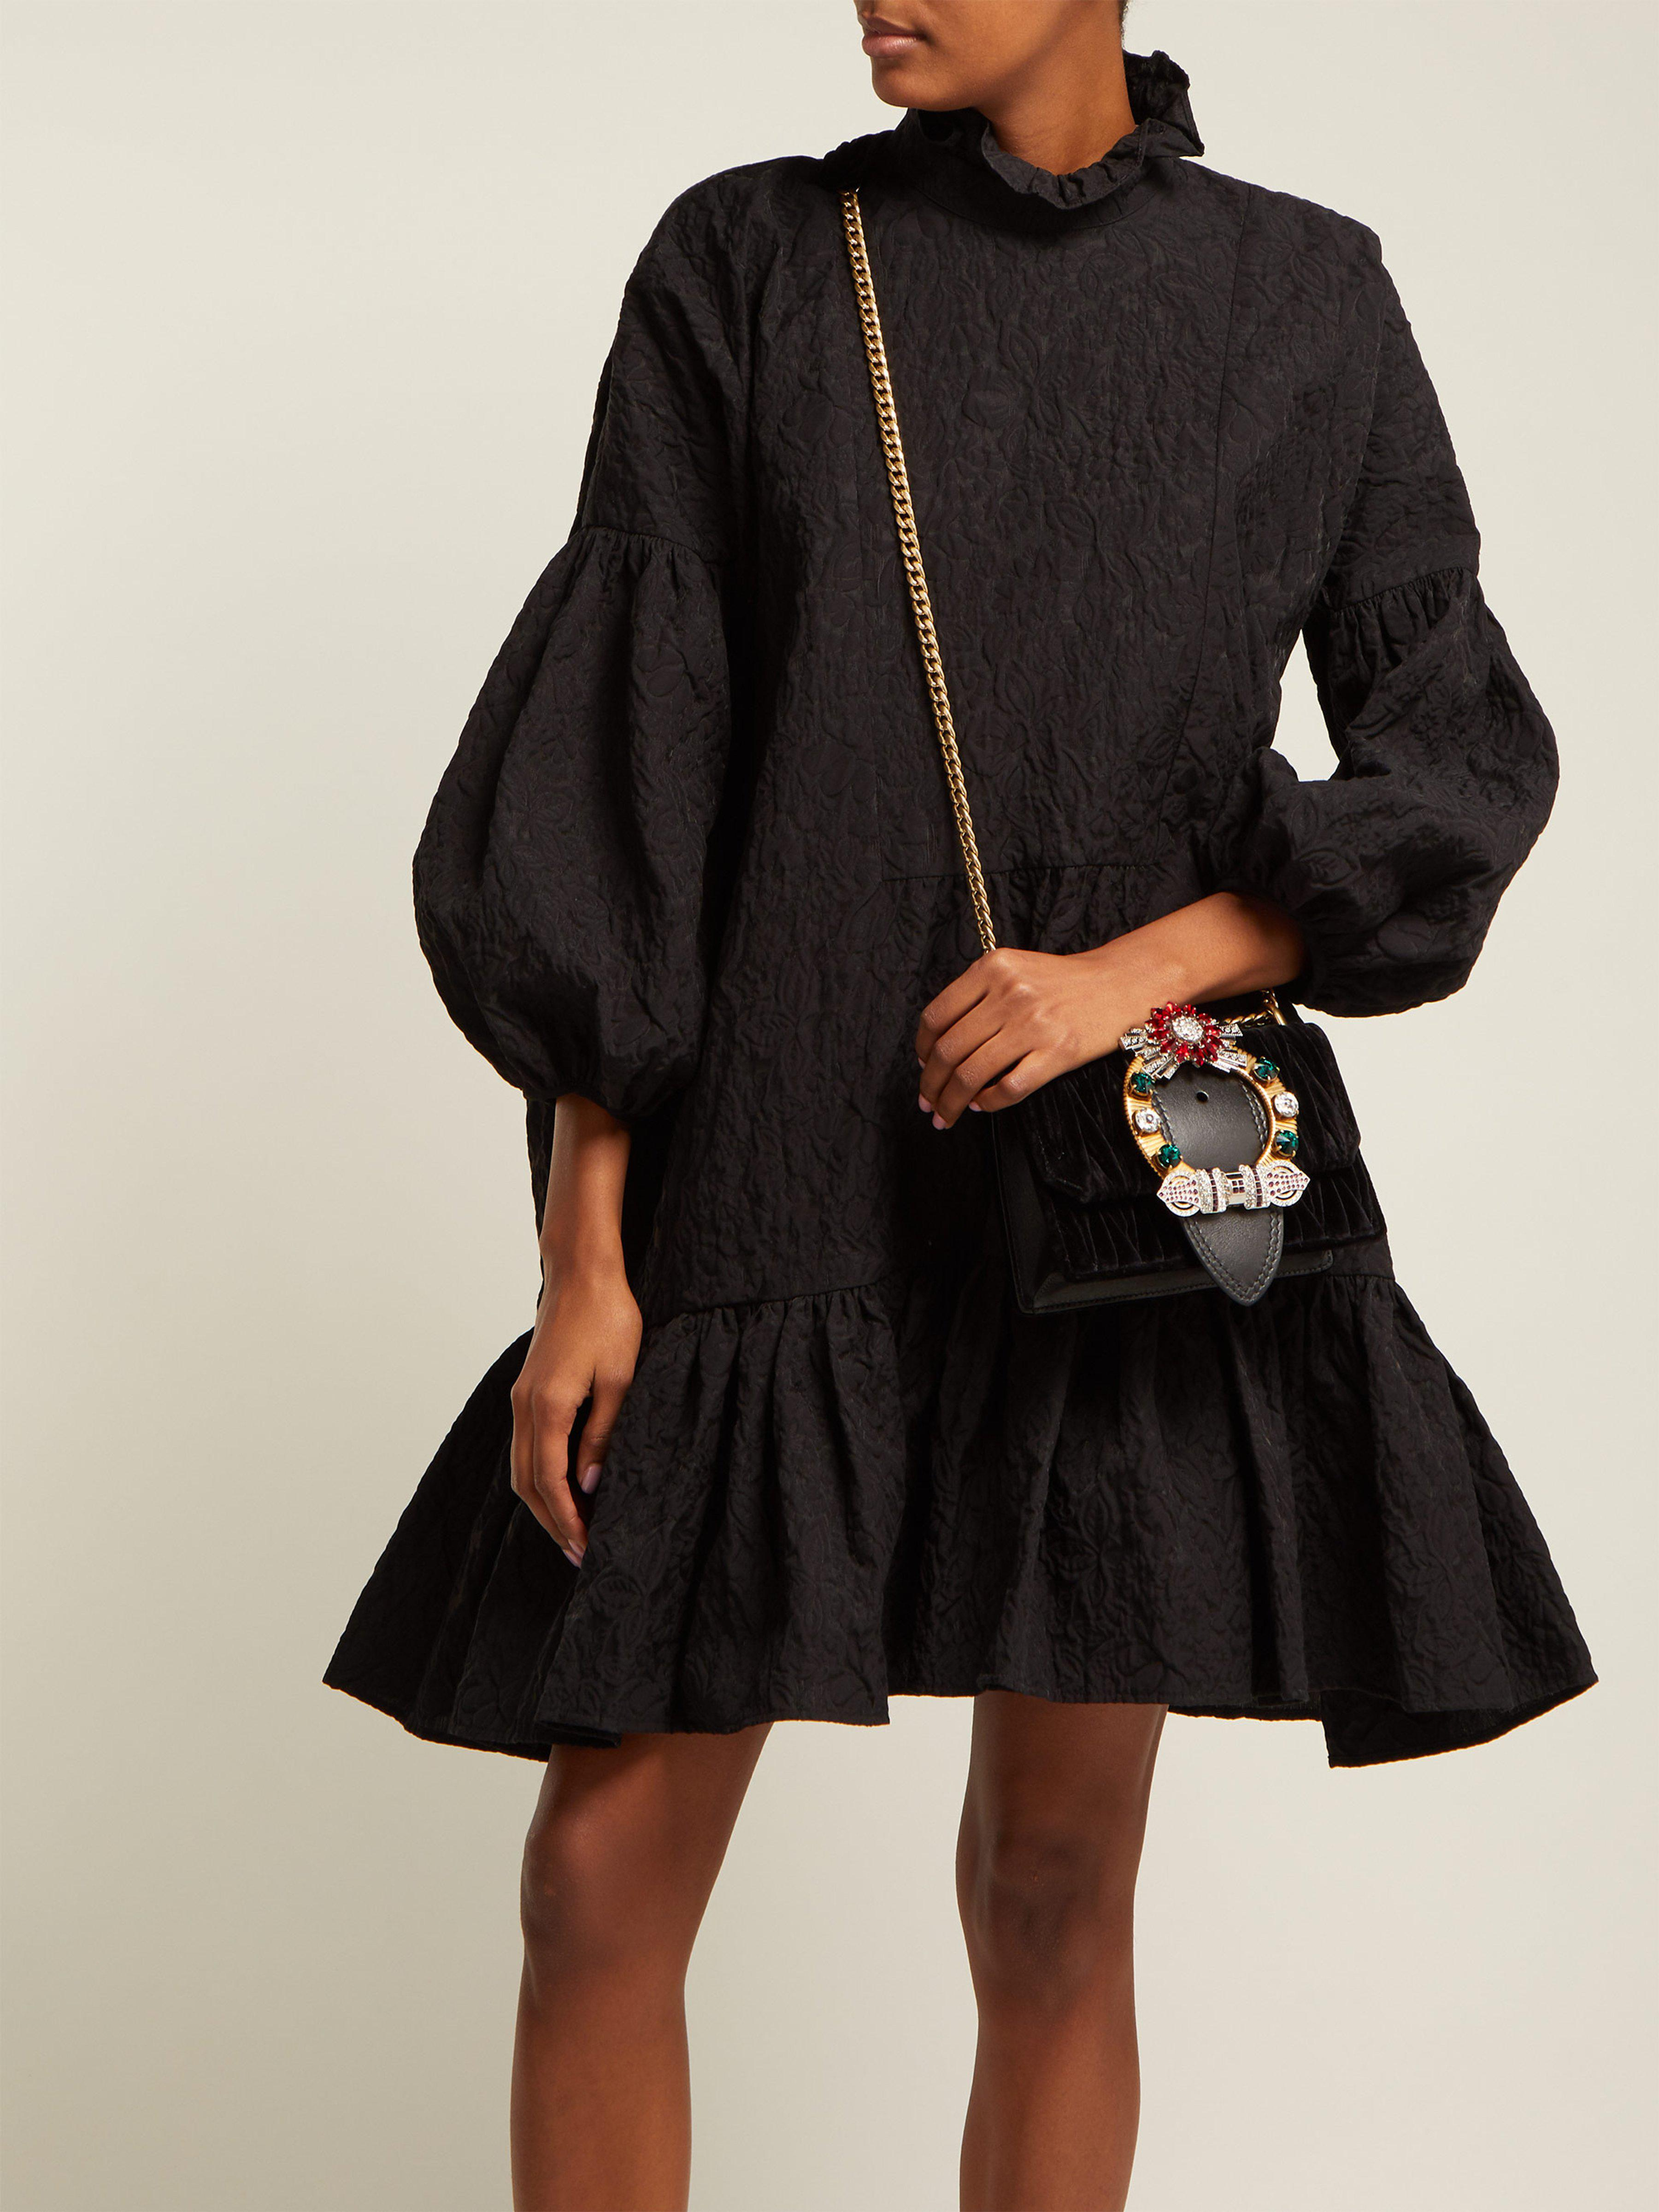 d833a3323a2f Miu Miu Lady Velvet Crossbody Bag in Black - Save 32.82051282051282% - Lyst